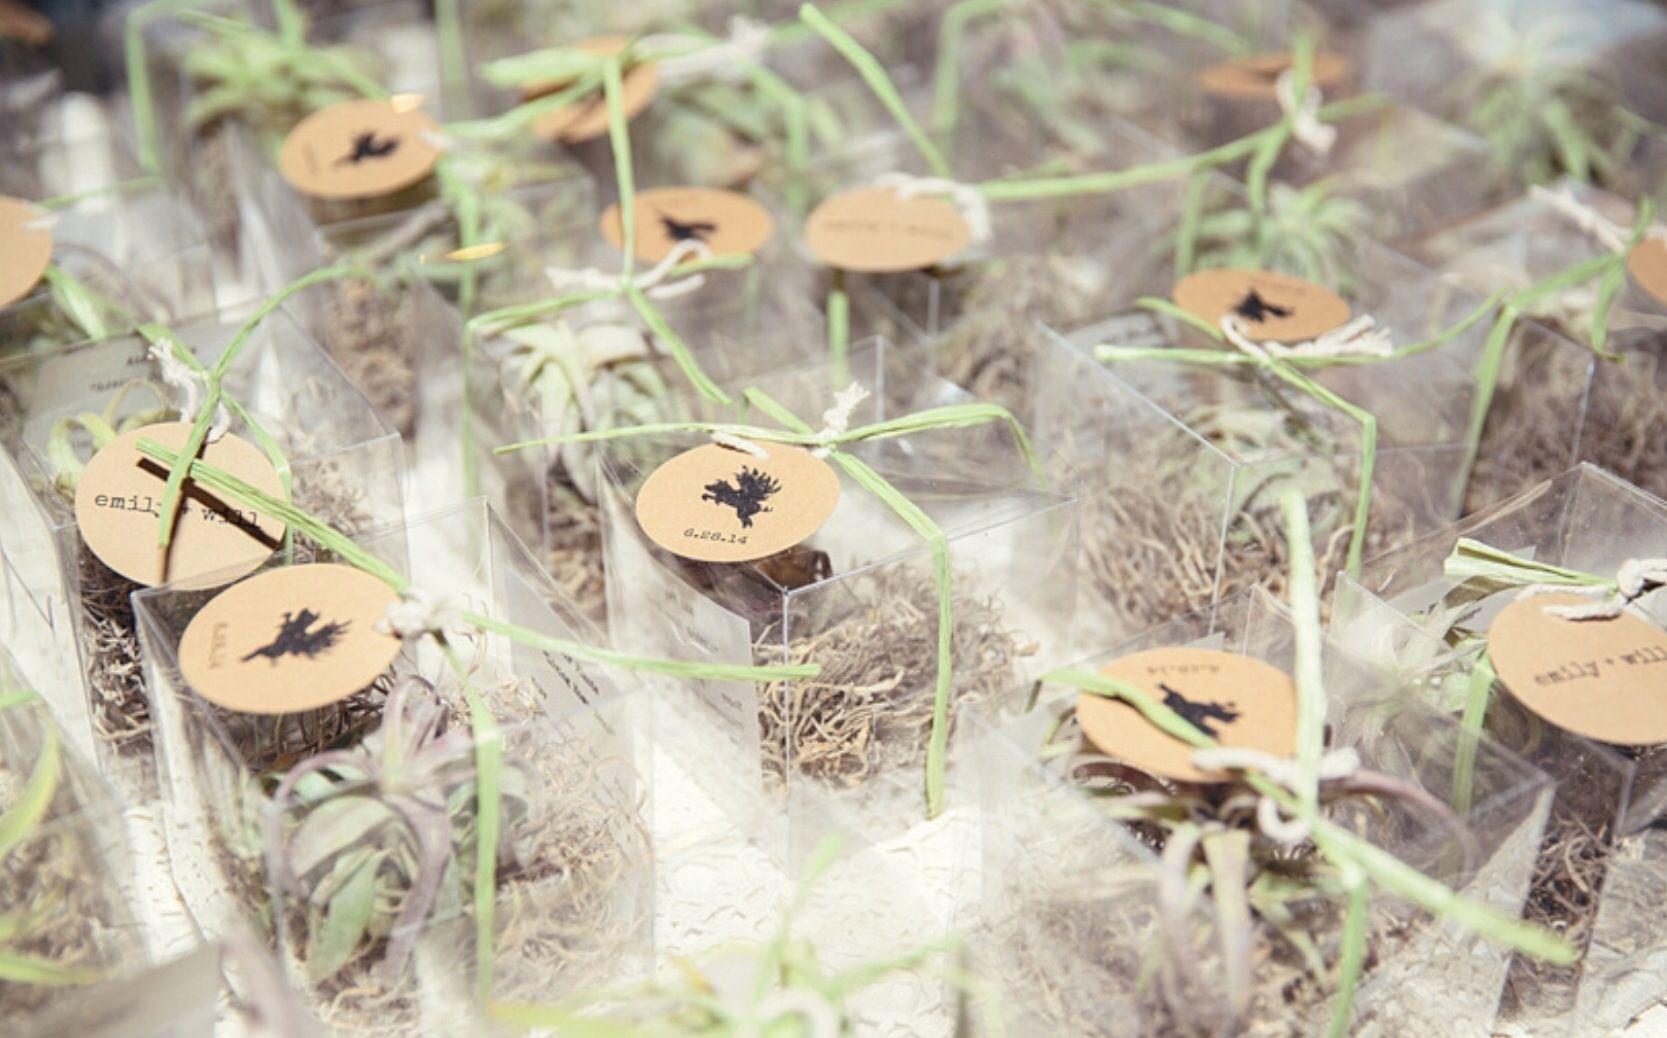 Air Plant wedding favor take aways | Air Plants | Pinterest | Plant ...